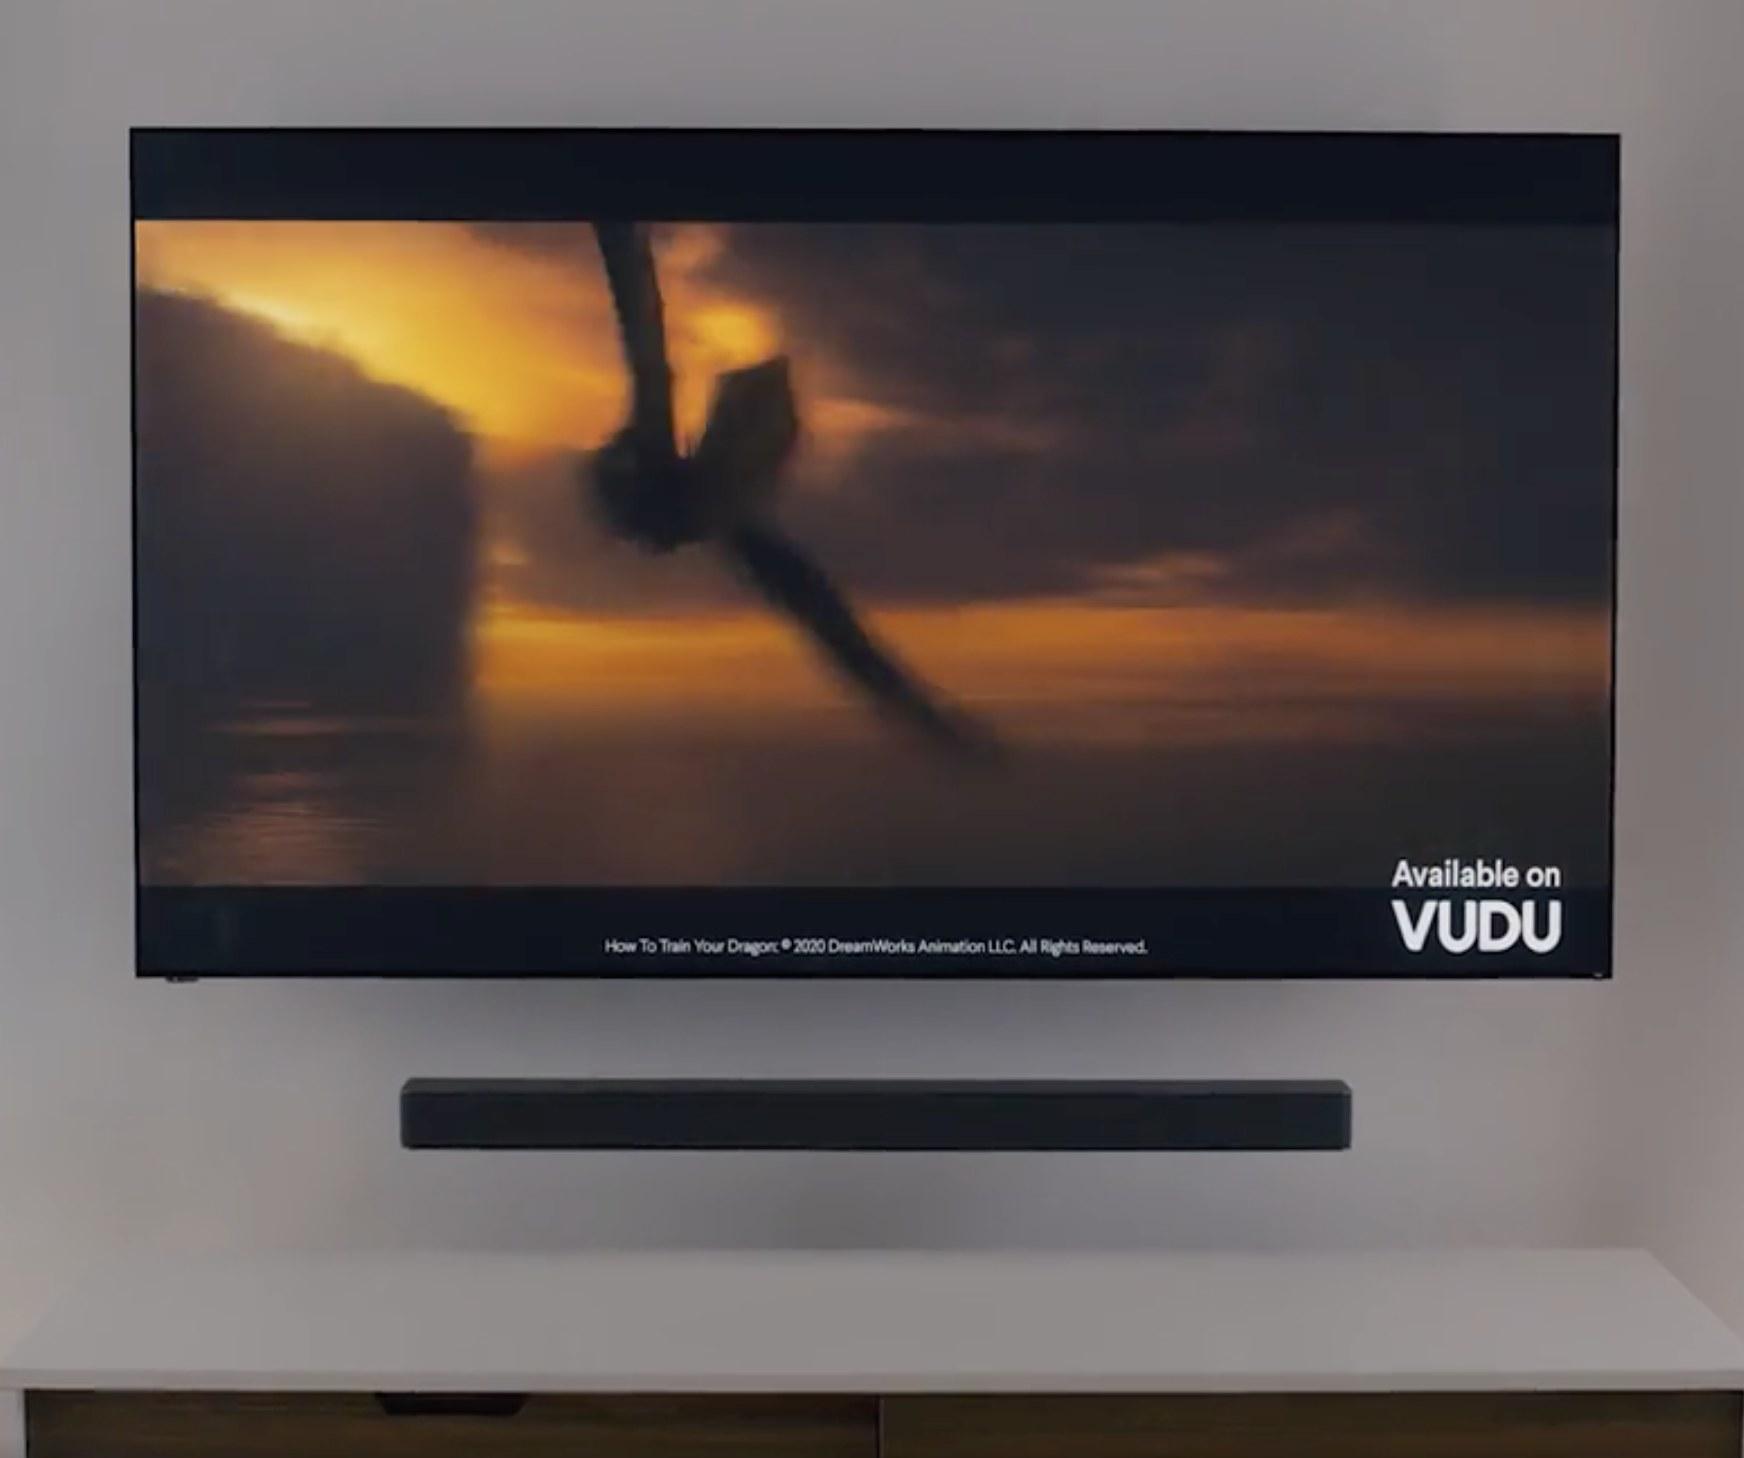 The soundbar under a mounted TV